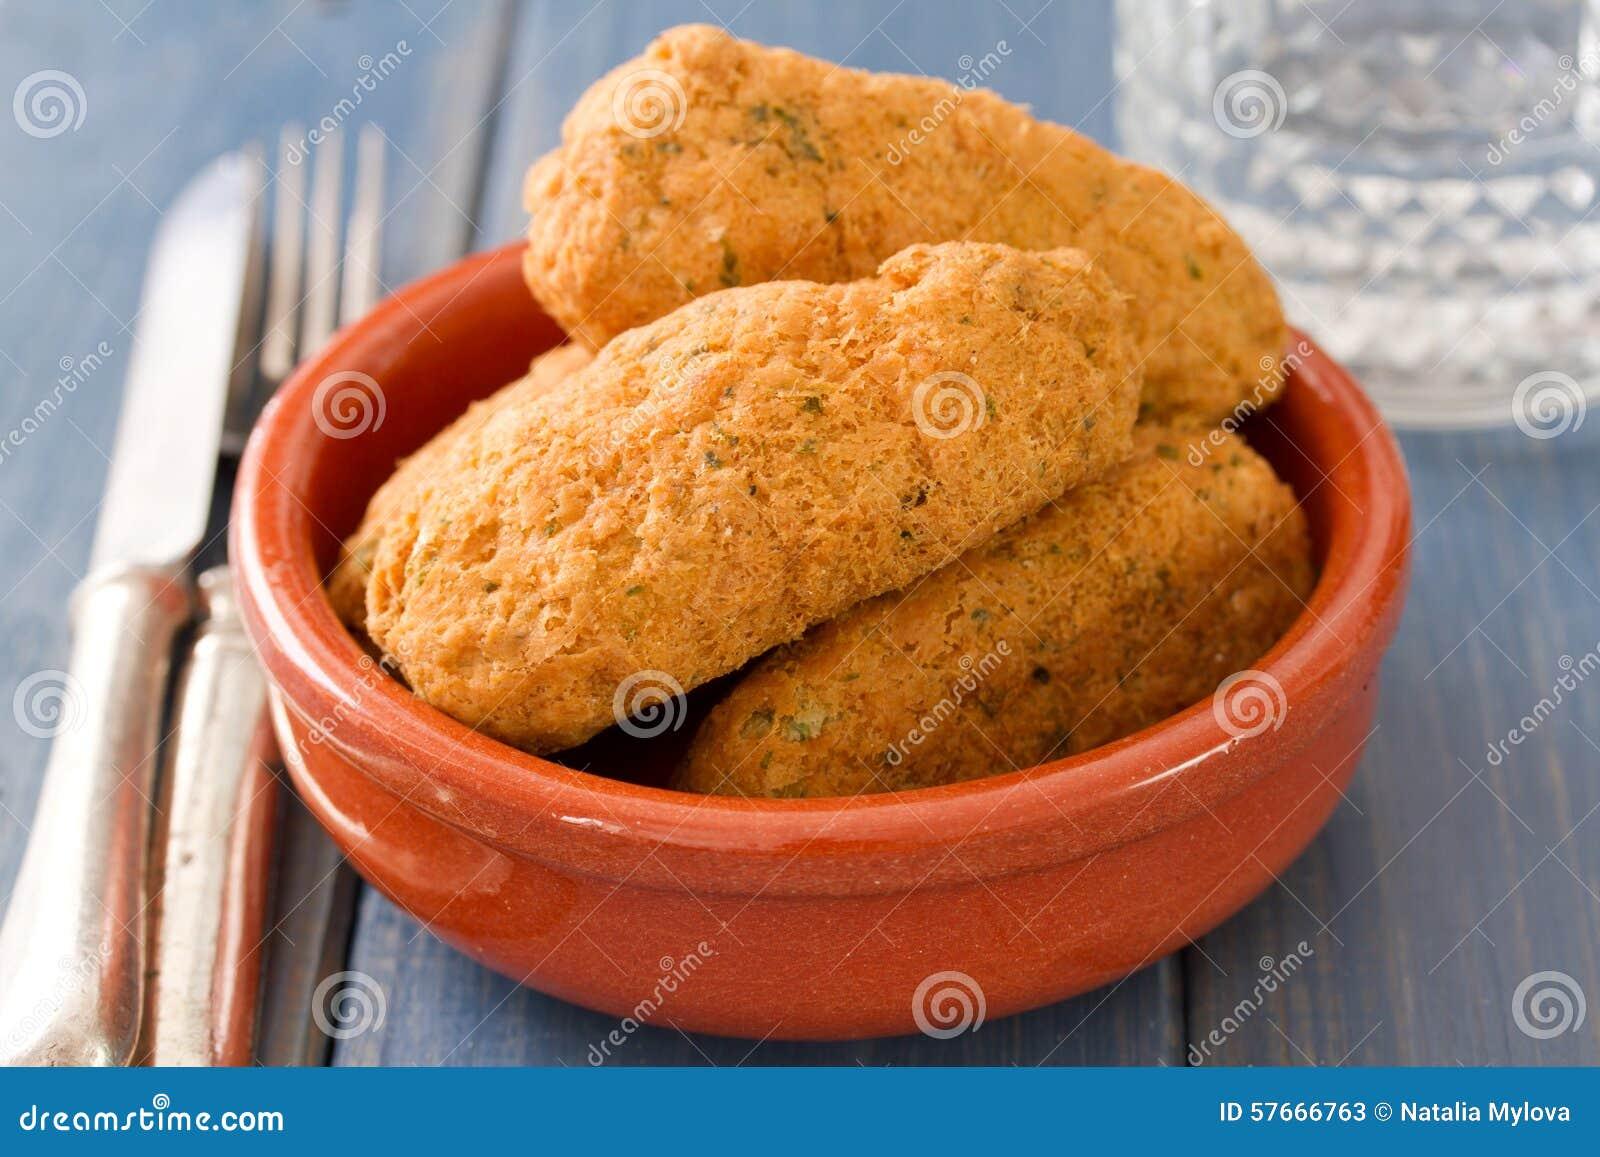 Fish croquettes on dish